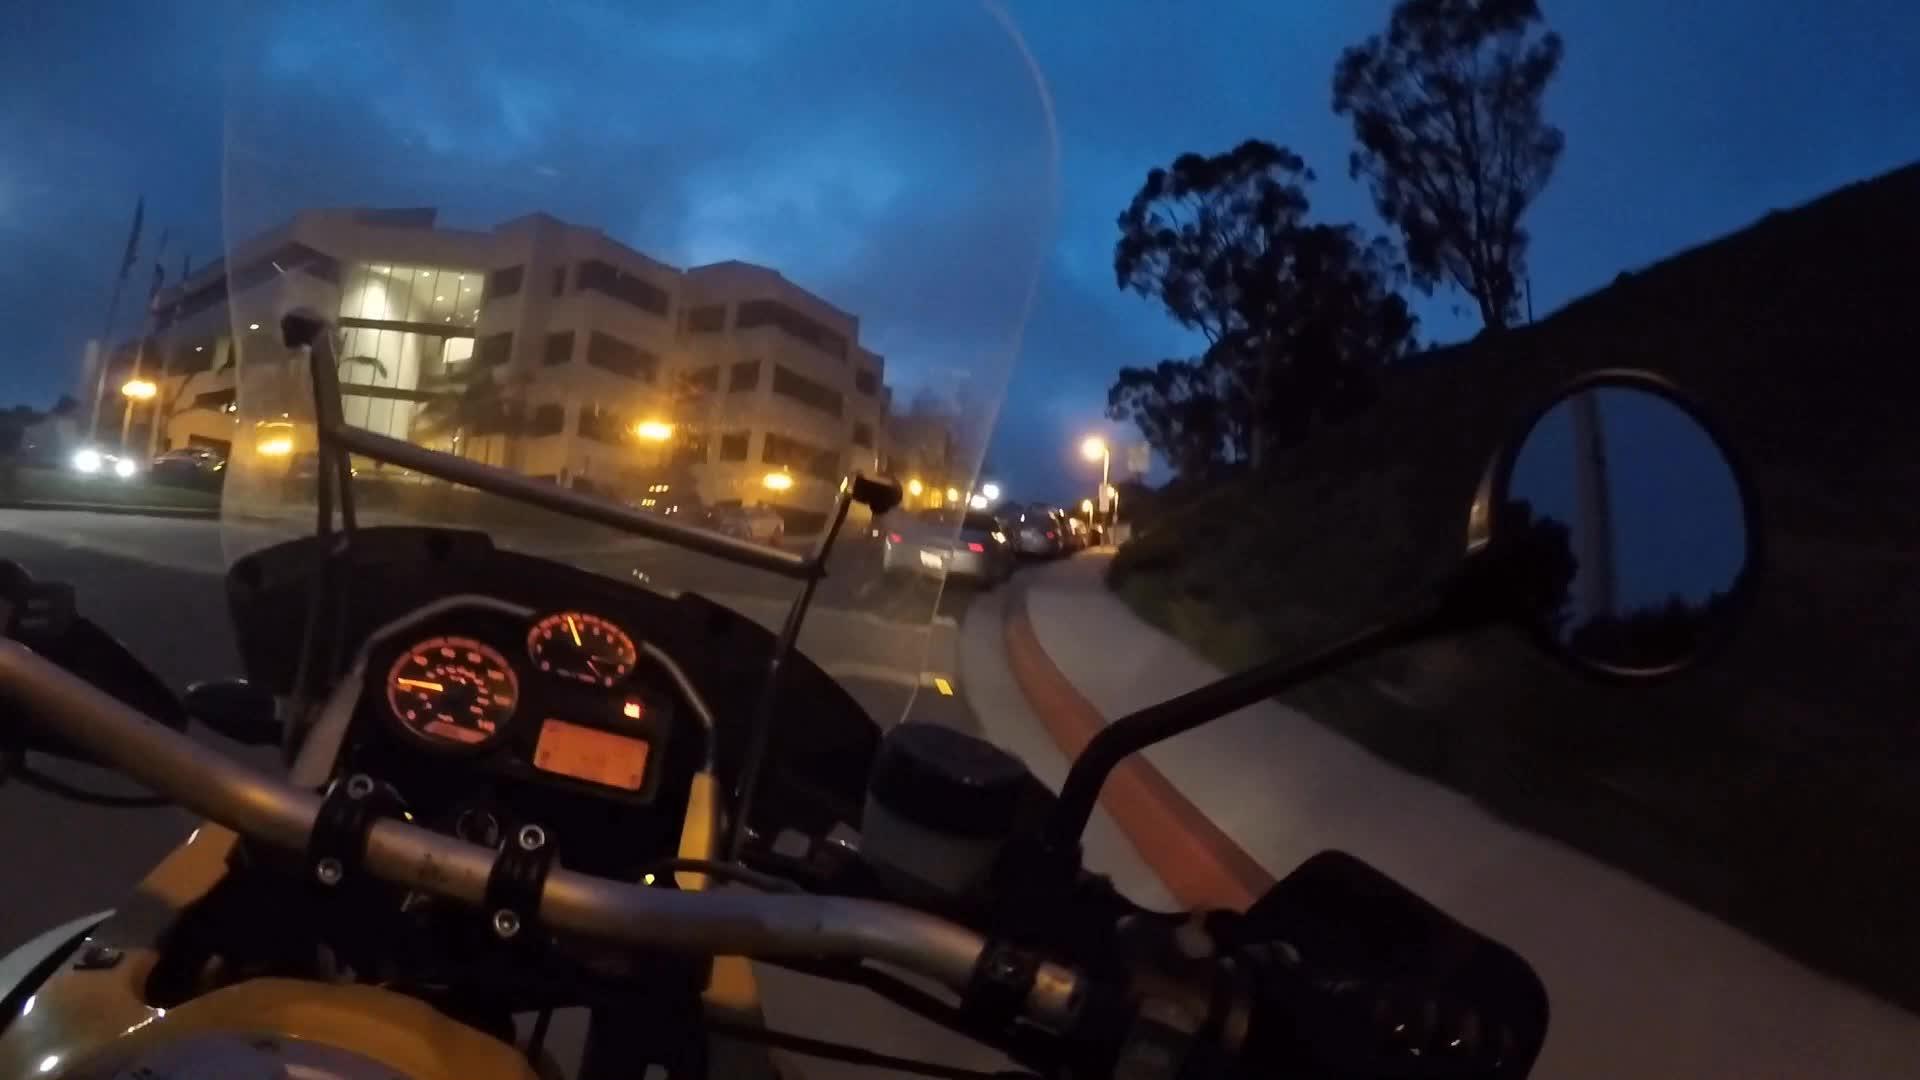 bmwgs, college, crt, crt challenge, moto, motorcycles, motorrad, pepperdine, wheelie, peppwheelie GIFs